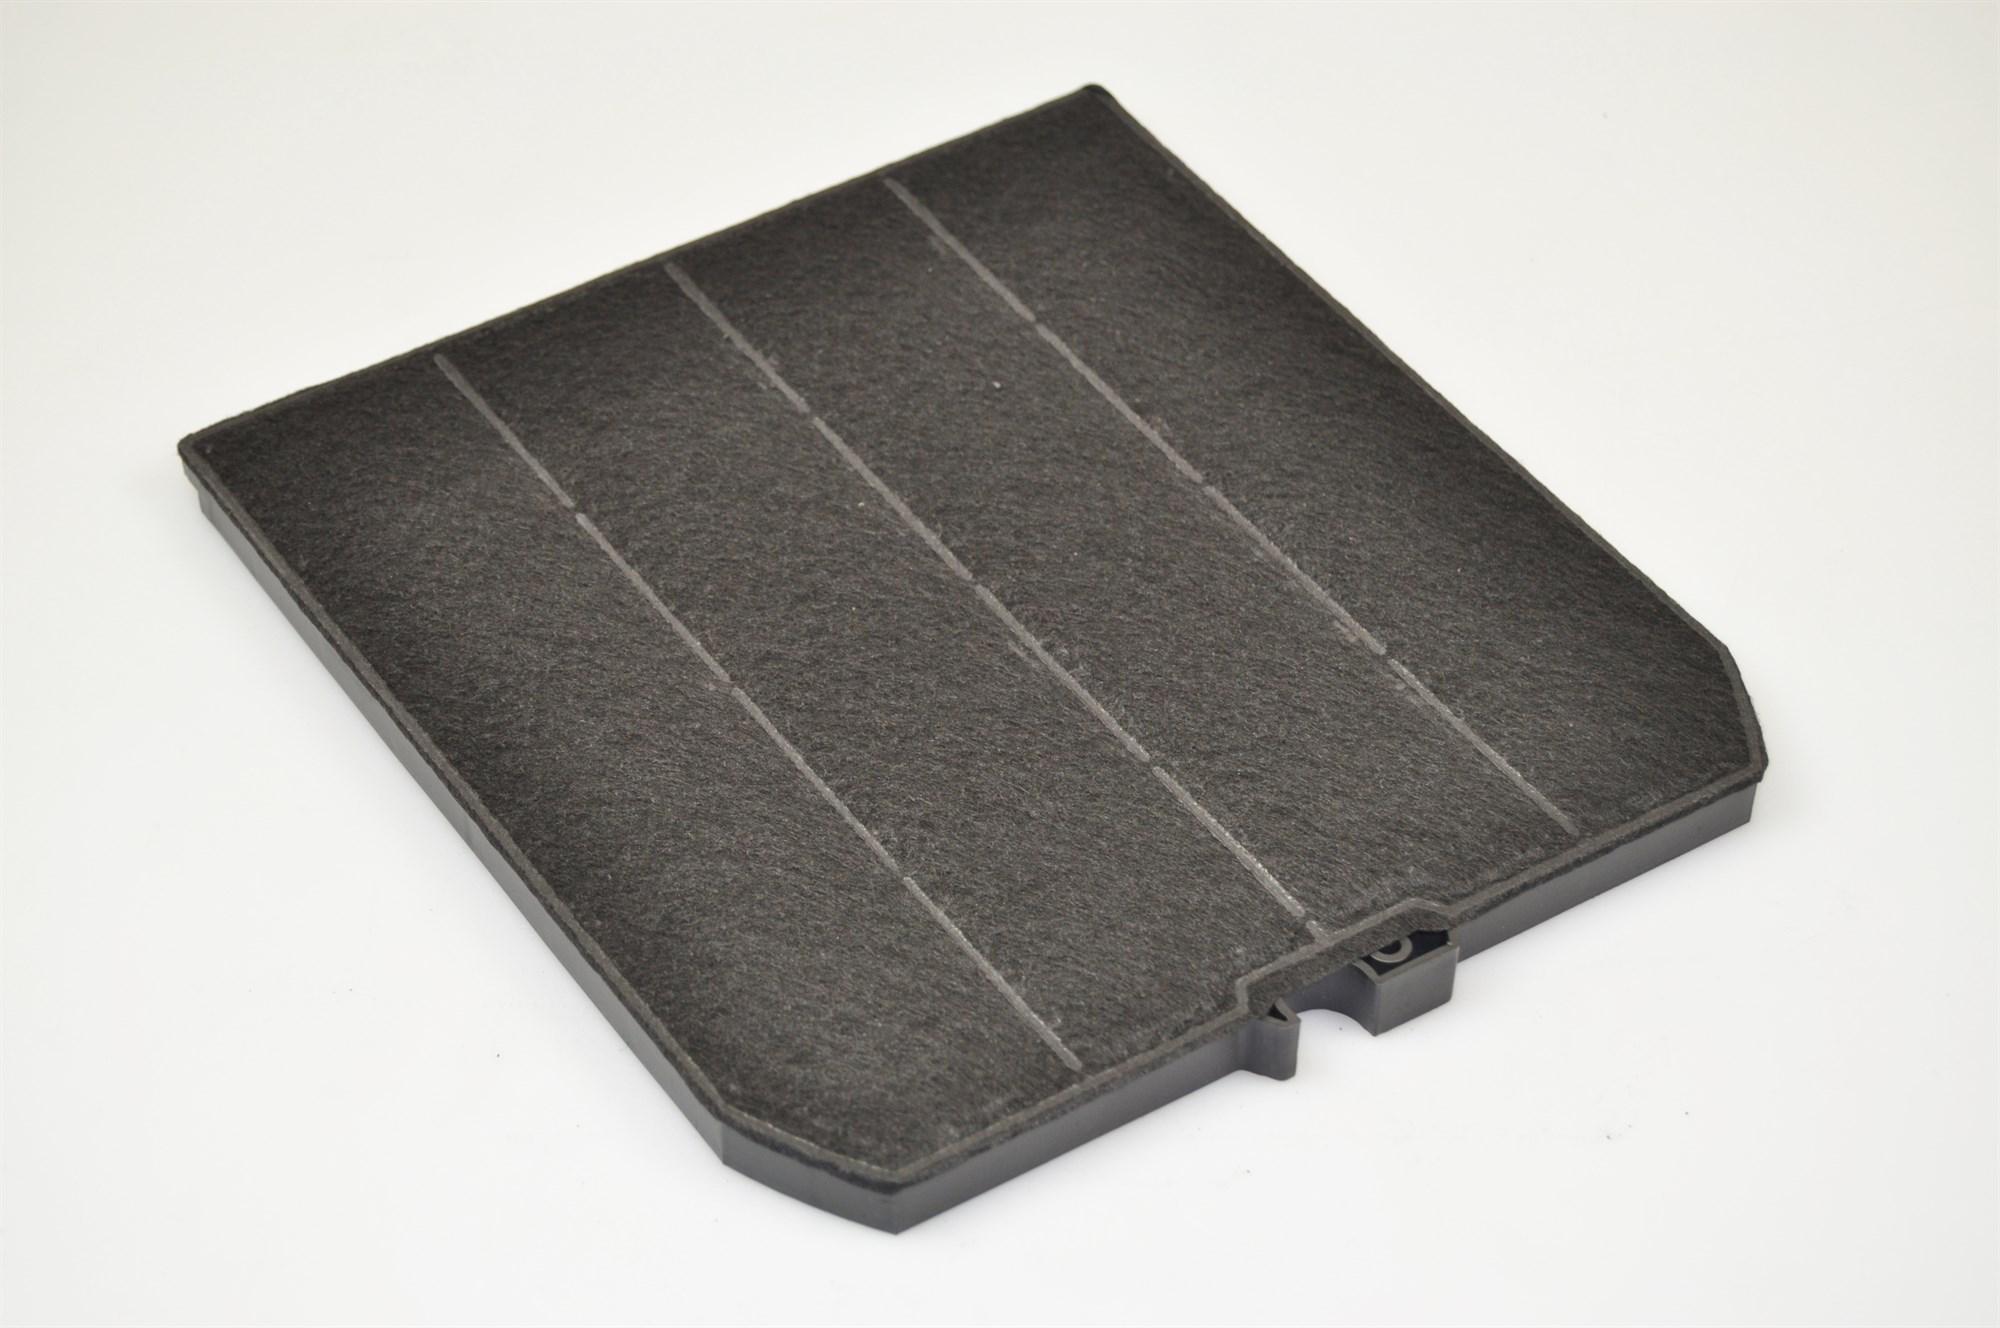 Kohlefilter Falmec Dunstabzugshaube 237x212 5mm